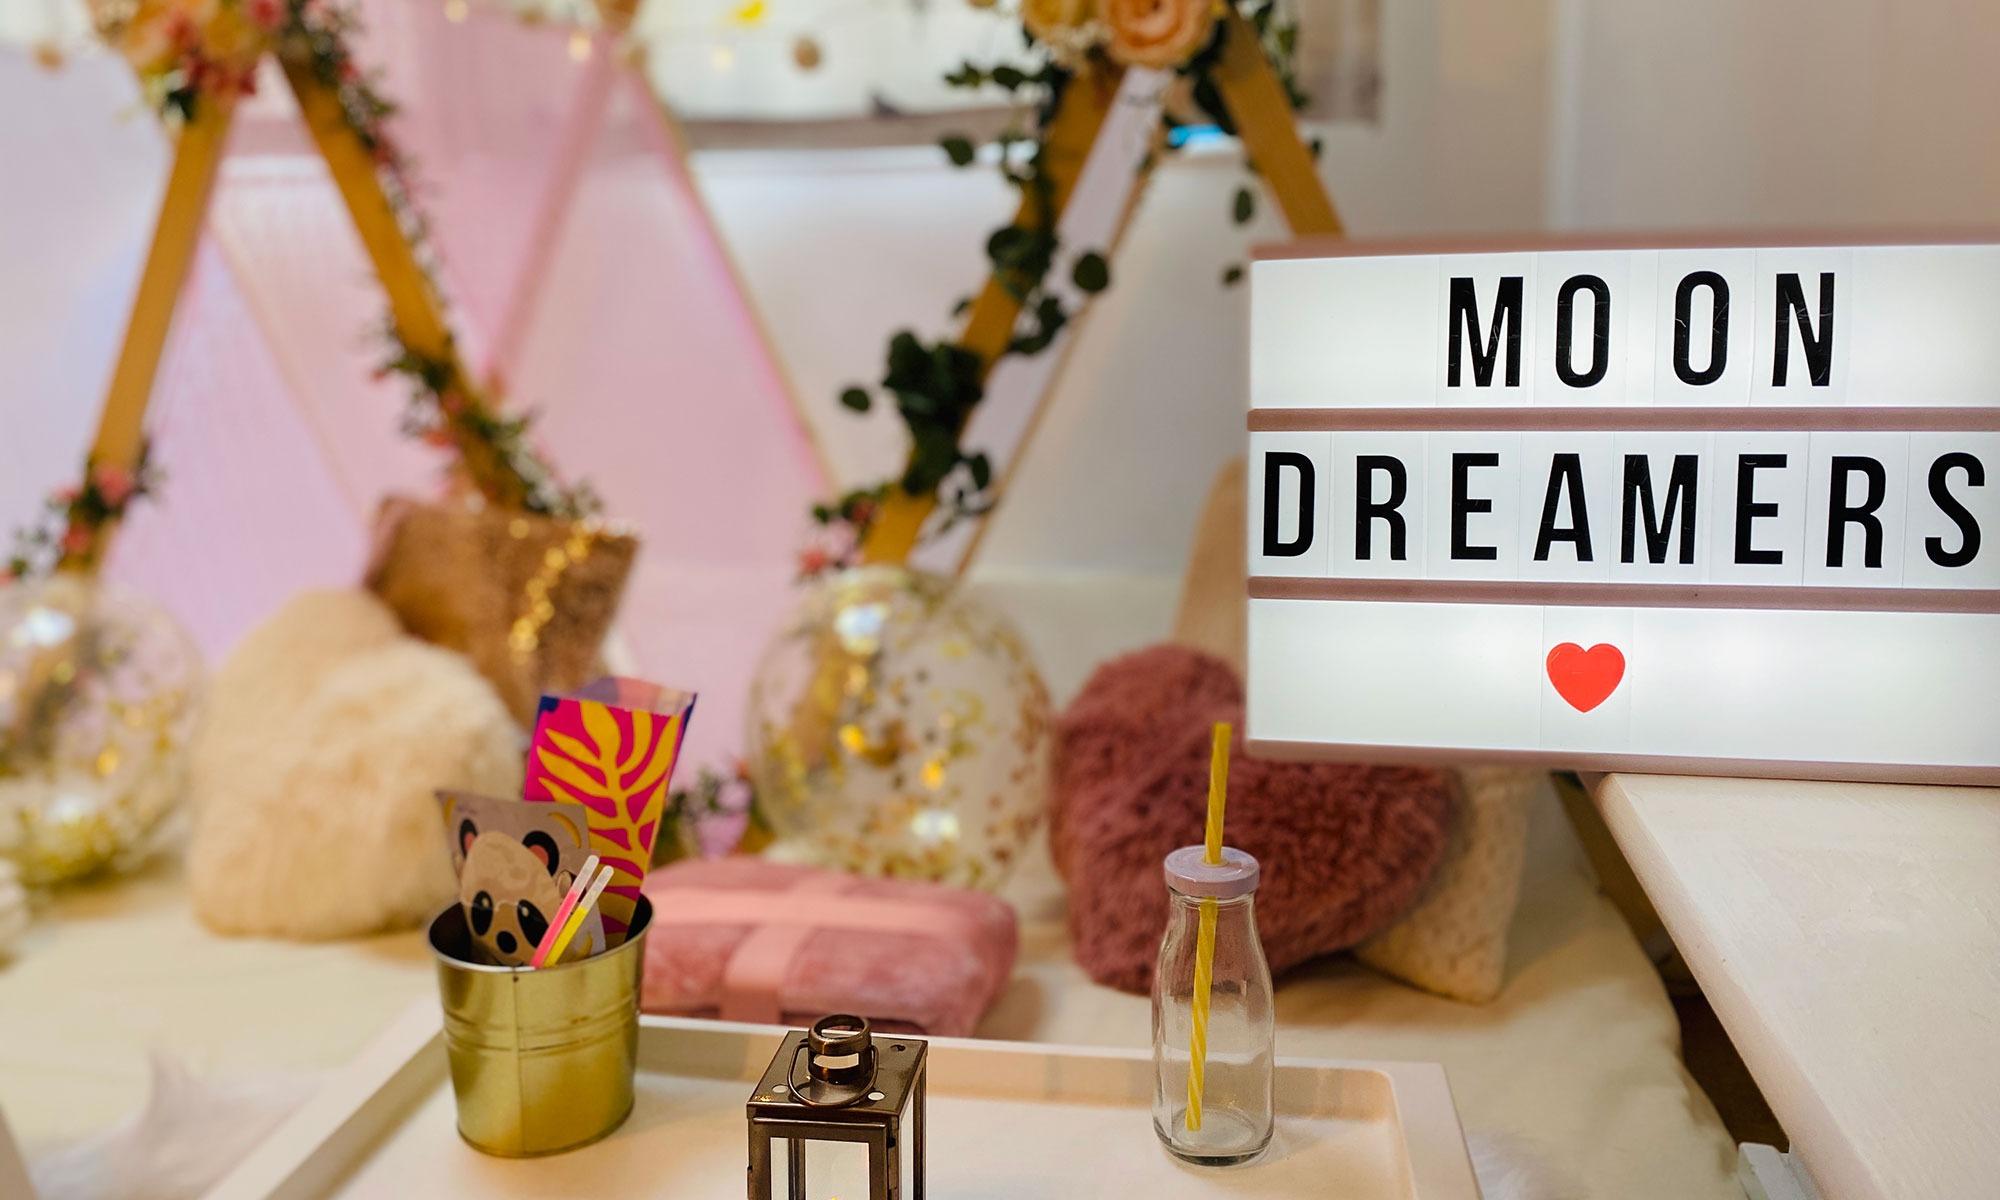 Luxury Glampovers & Children's Sleepover| Moon Dreamers